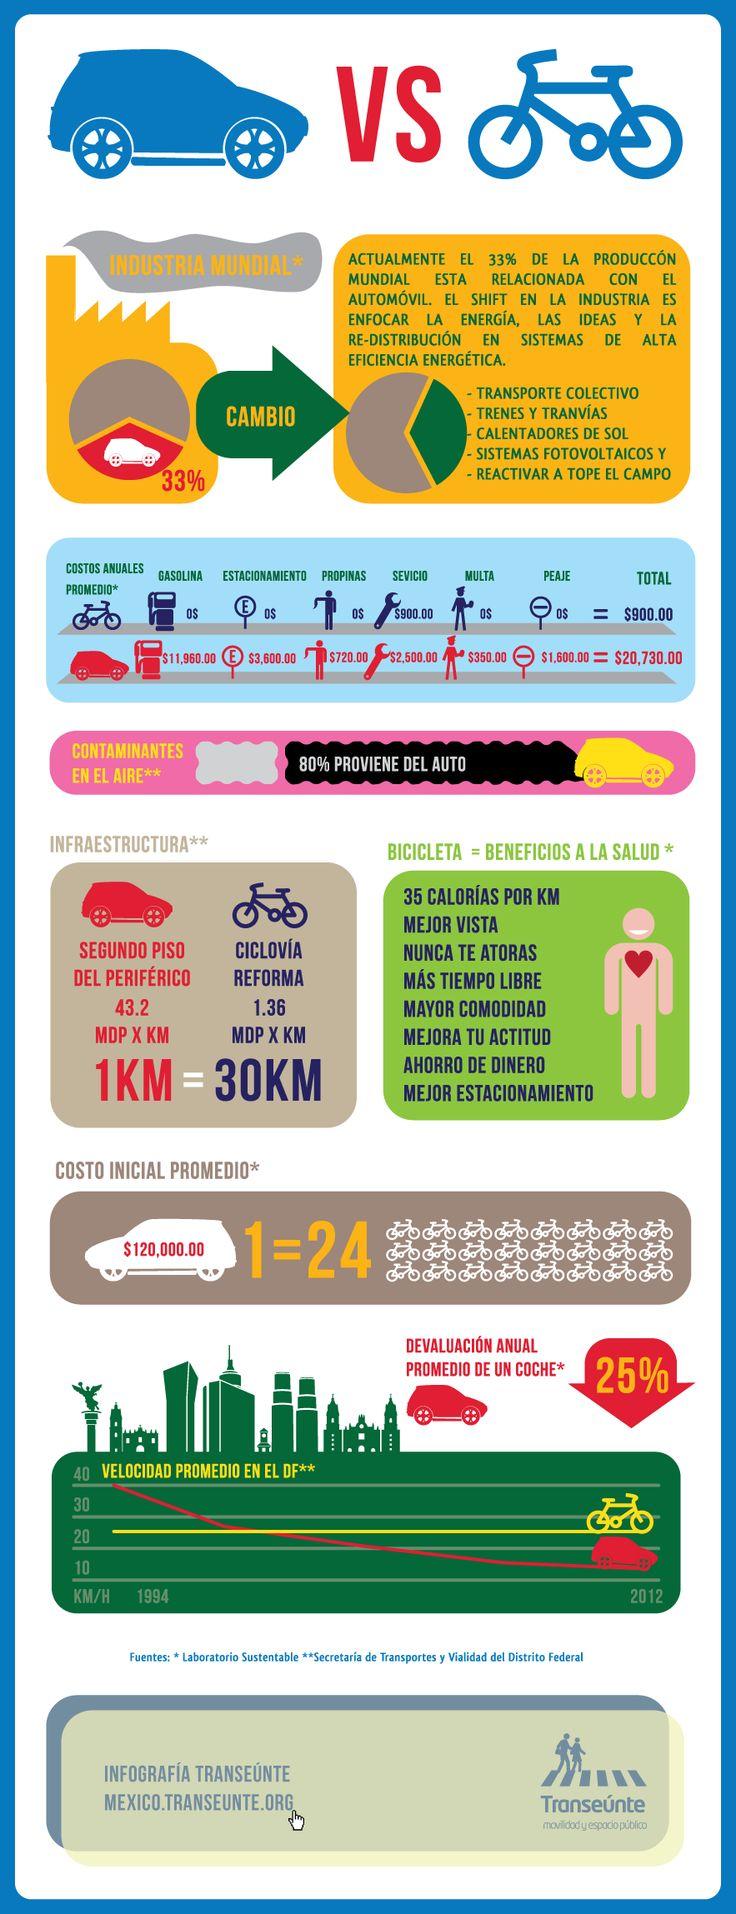 Bicicleta vs automovil, infografia.